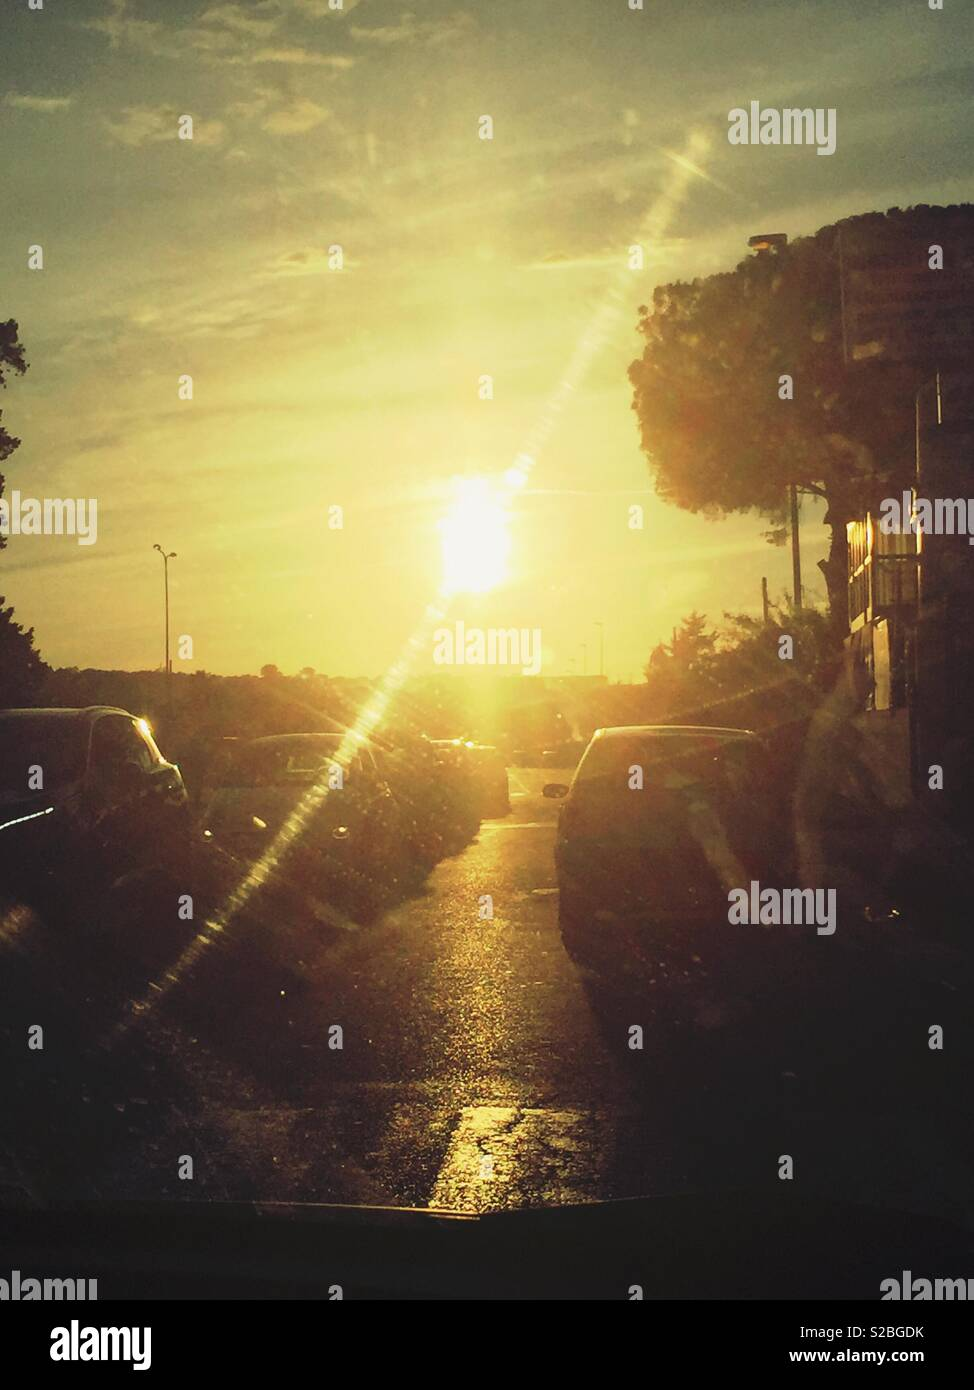 Traffico sul tramonto - Stock Image